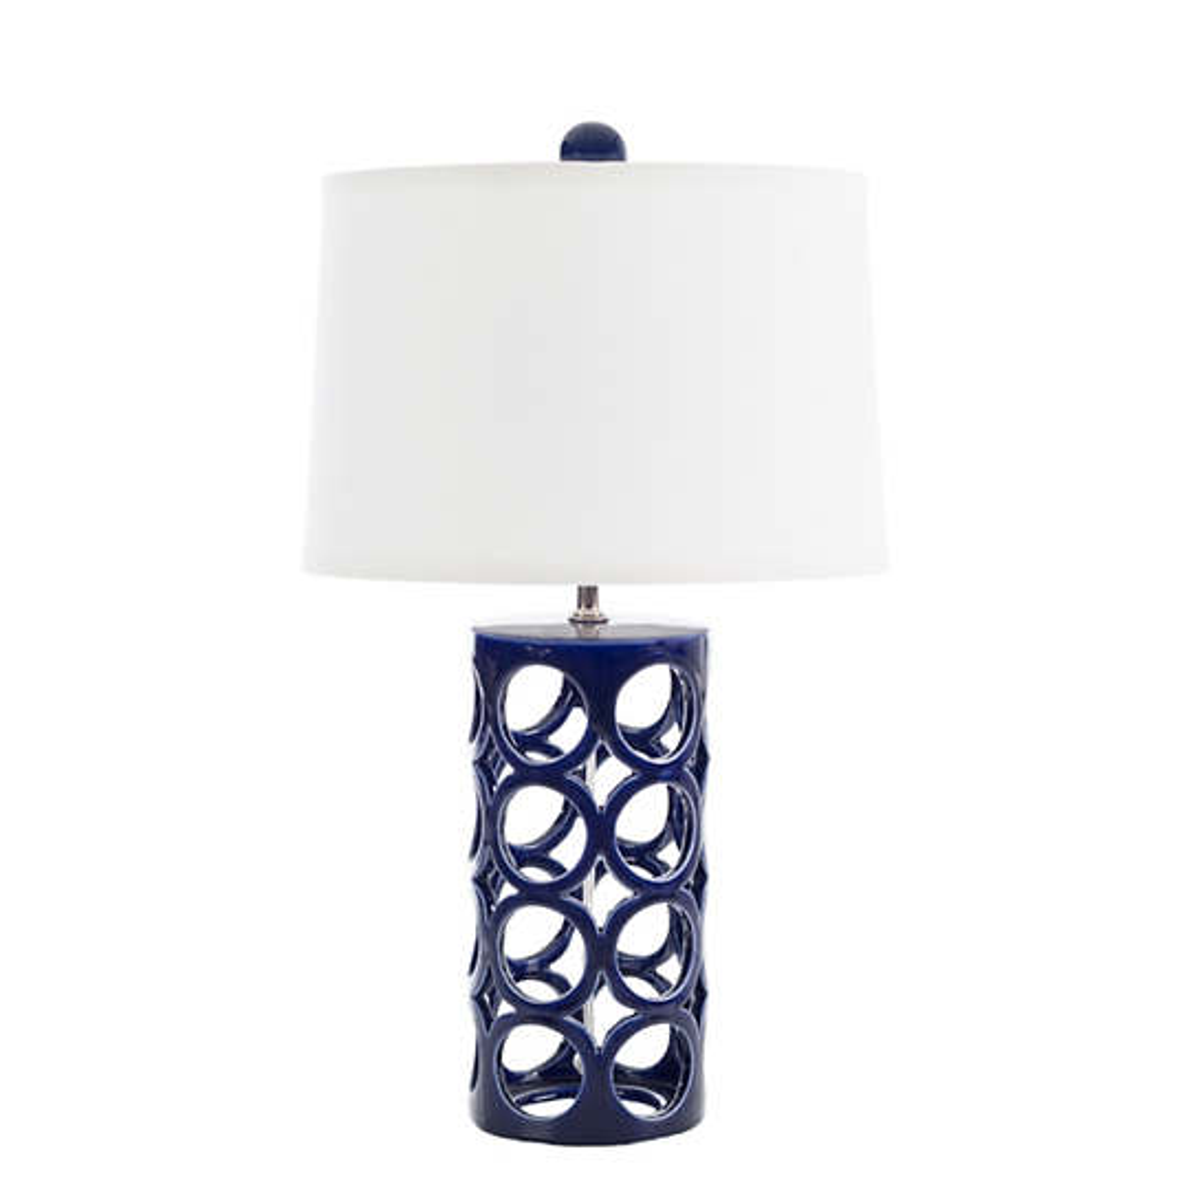 Indigo Medium Cylinder Icu Lamp